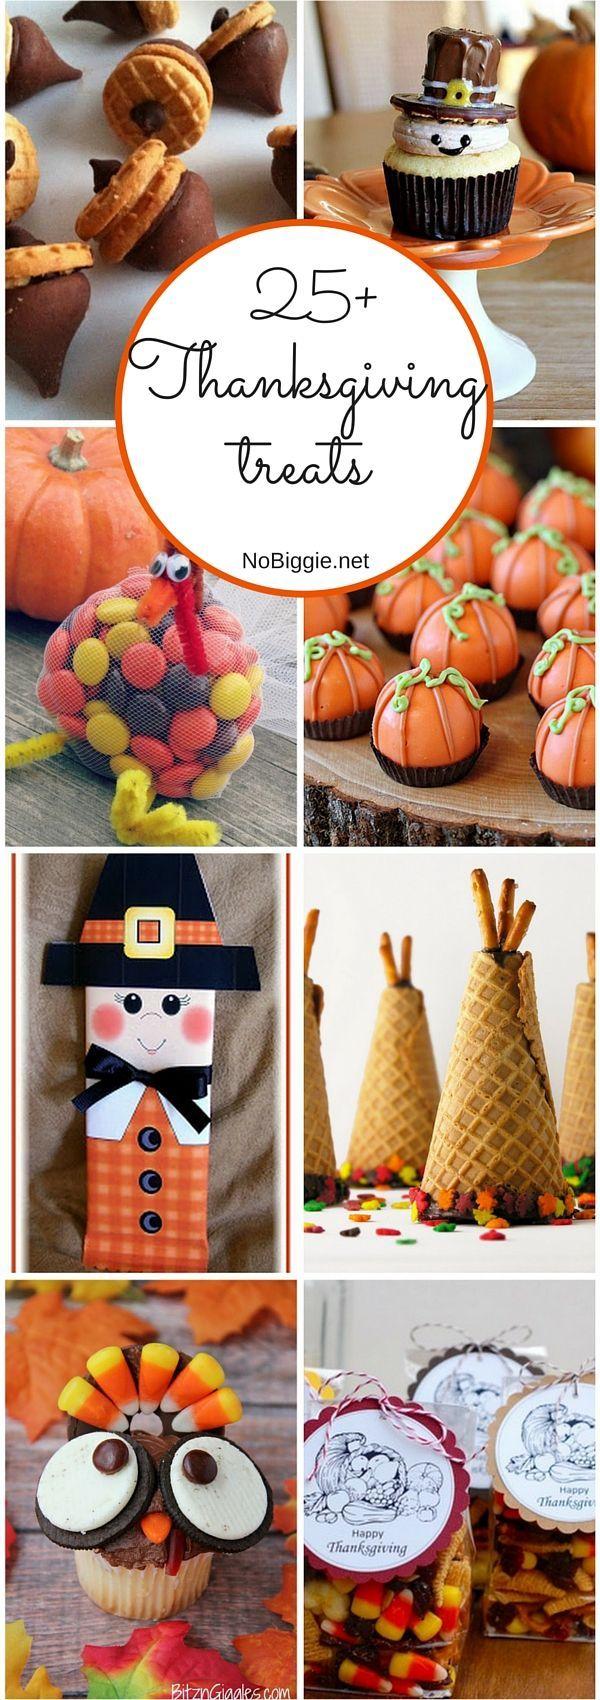 25+ Thanksgiving treats- NoBiggie.net